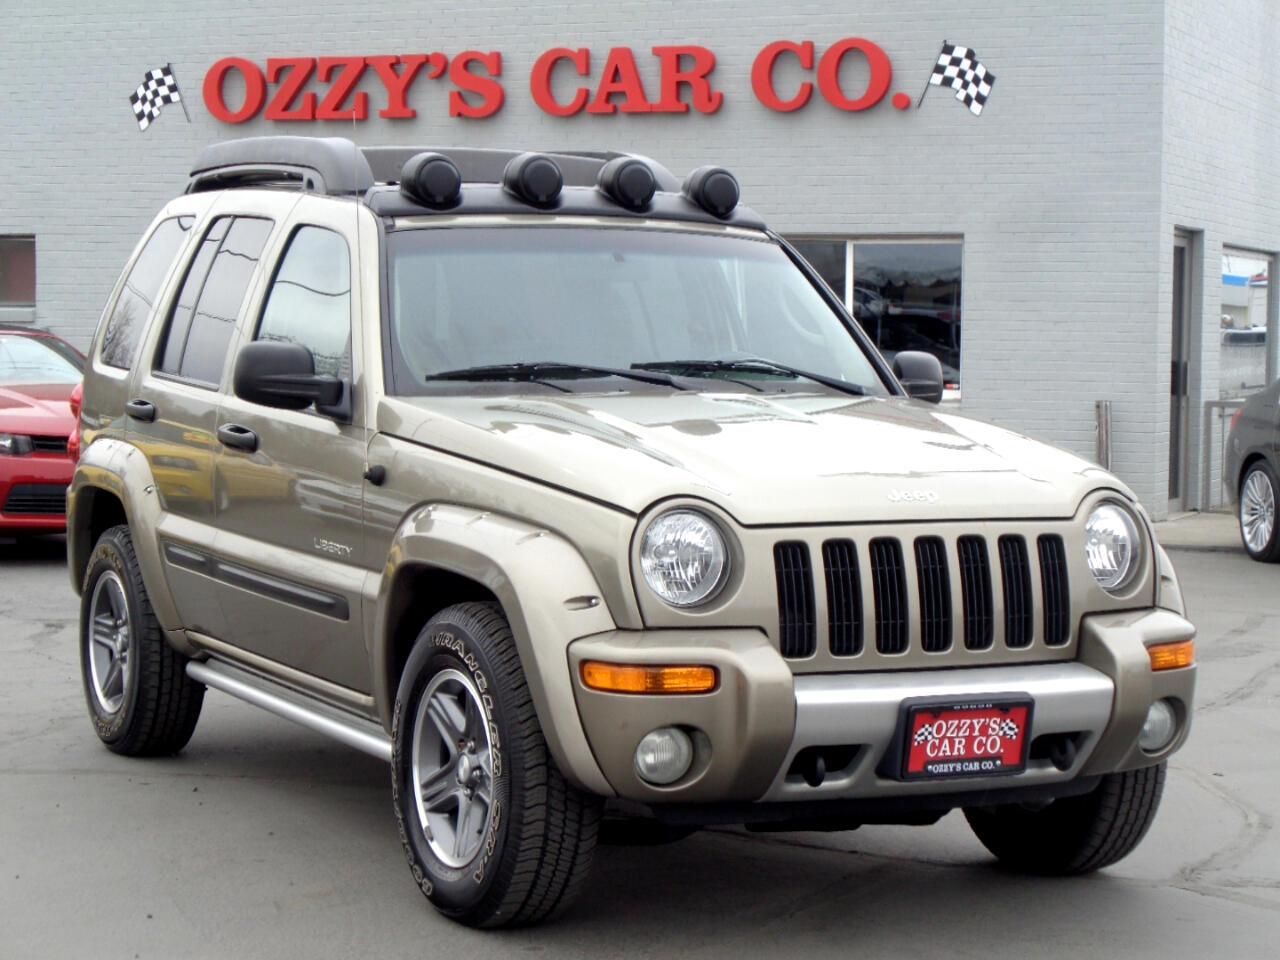 2004 Jeep Liberty 4dr Renegade 4WD